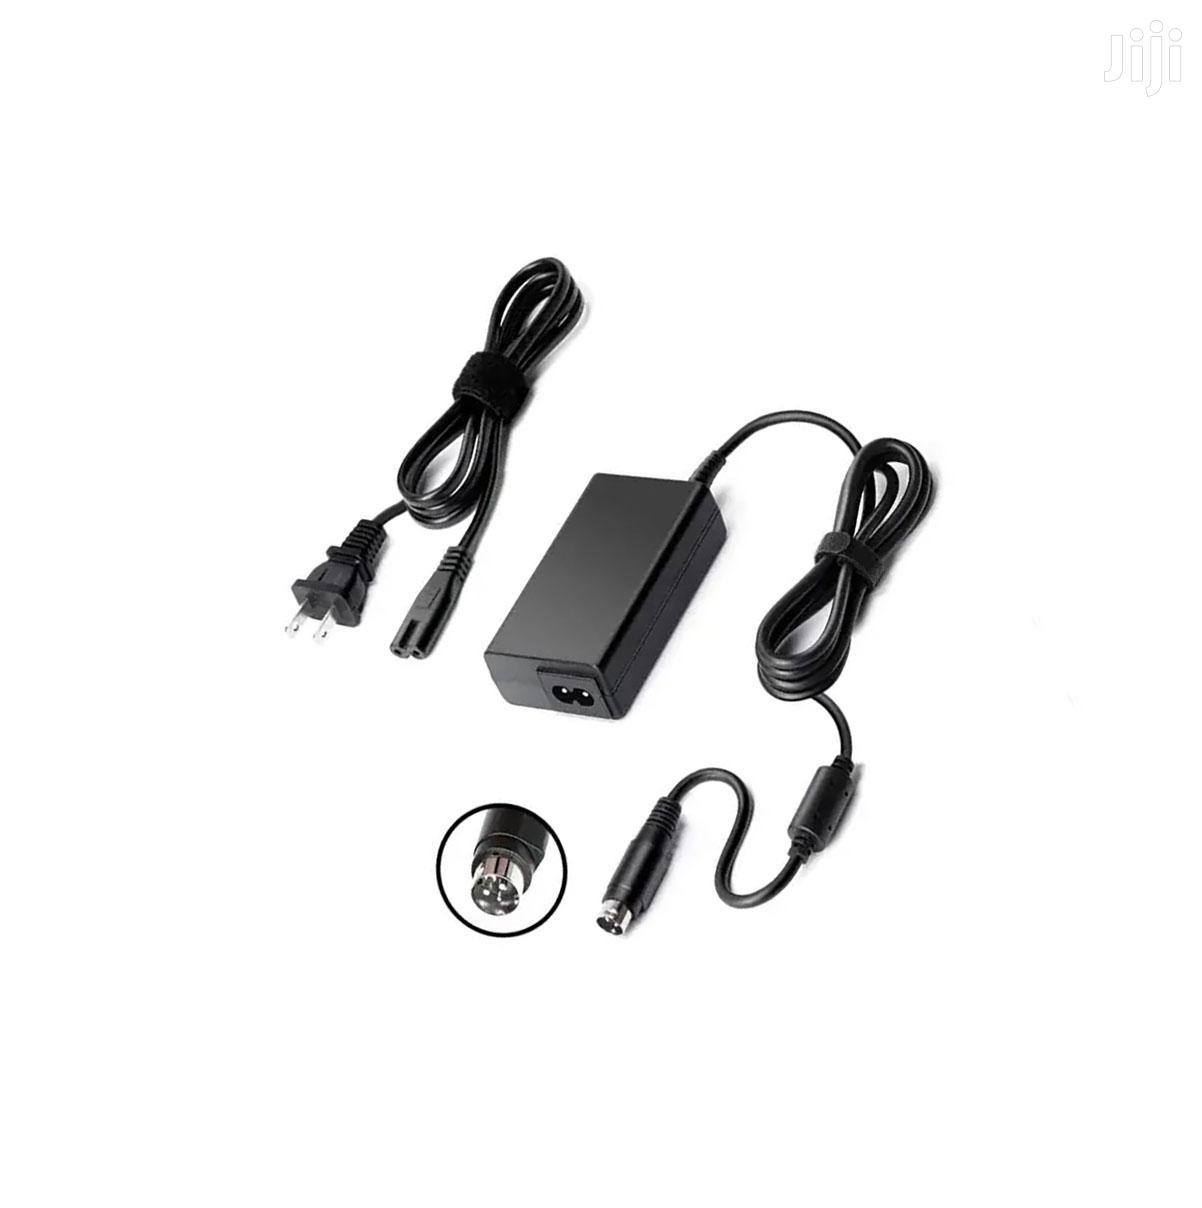 Power Supply 24V 2.5/ Thermal Receipt Printer Power Adapter